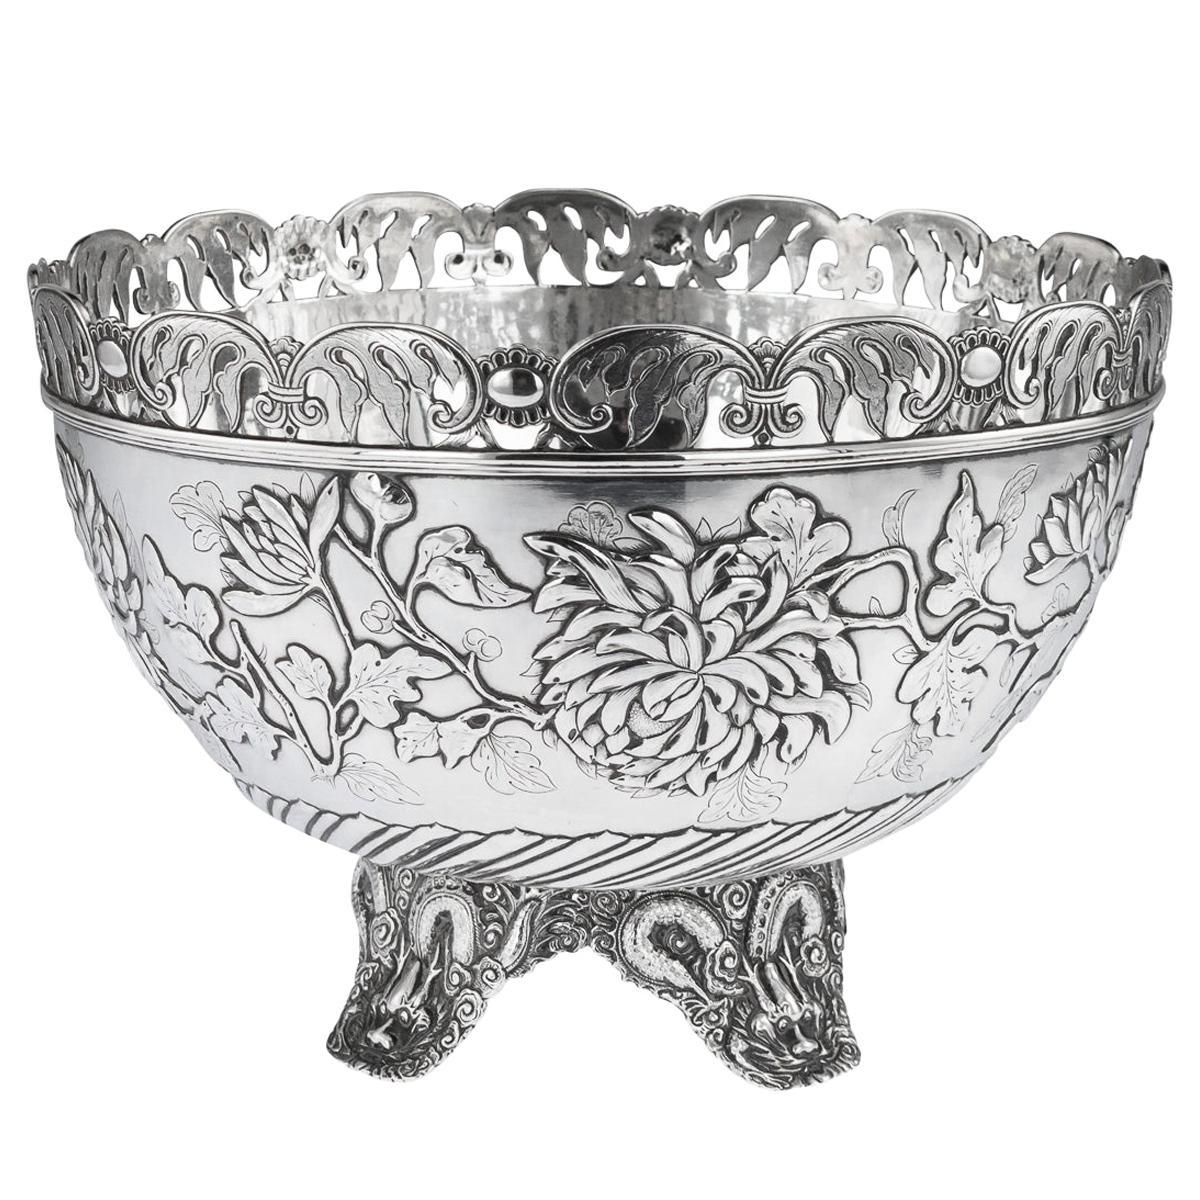 19th Century Chinese Export Solid Silver Bowl, Wing Cheong, Hong Kong c.1890